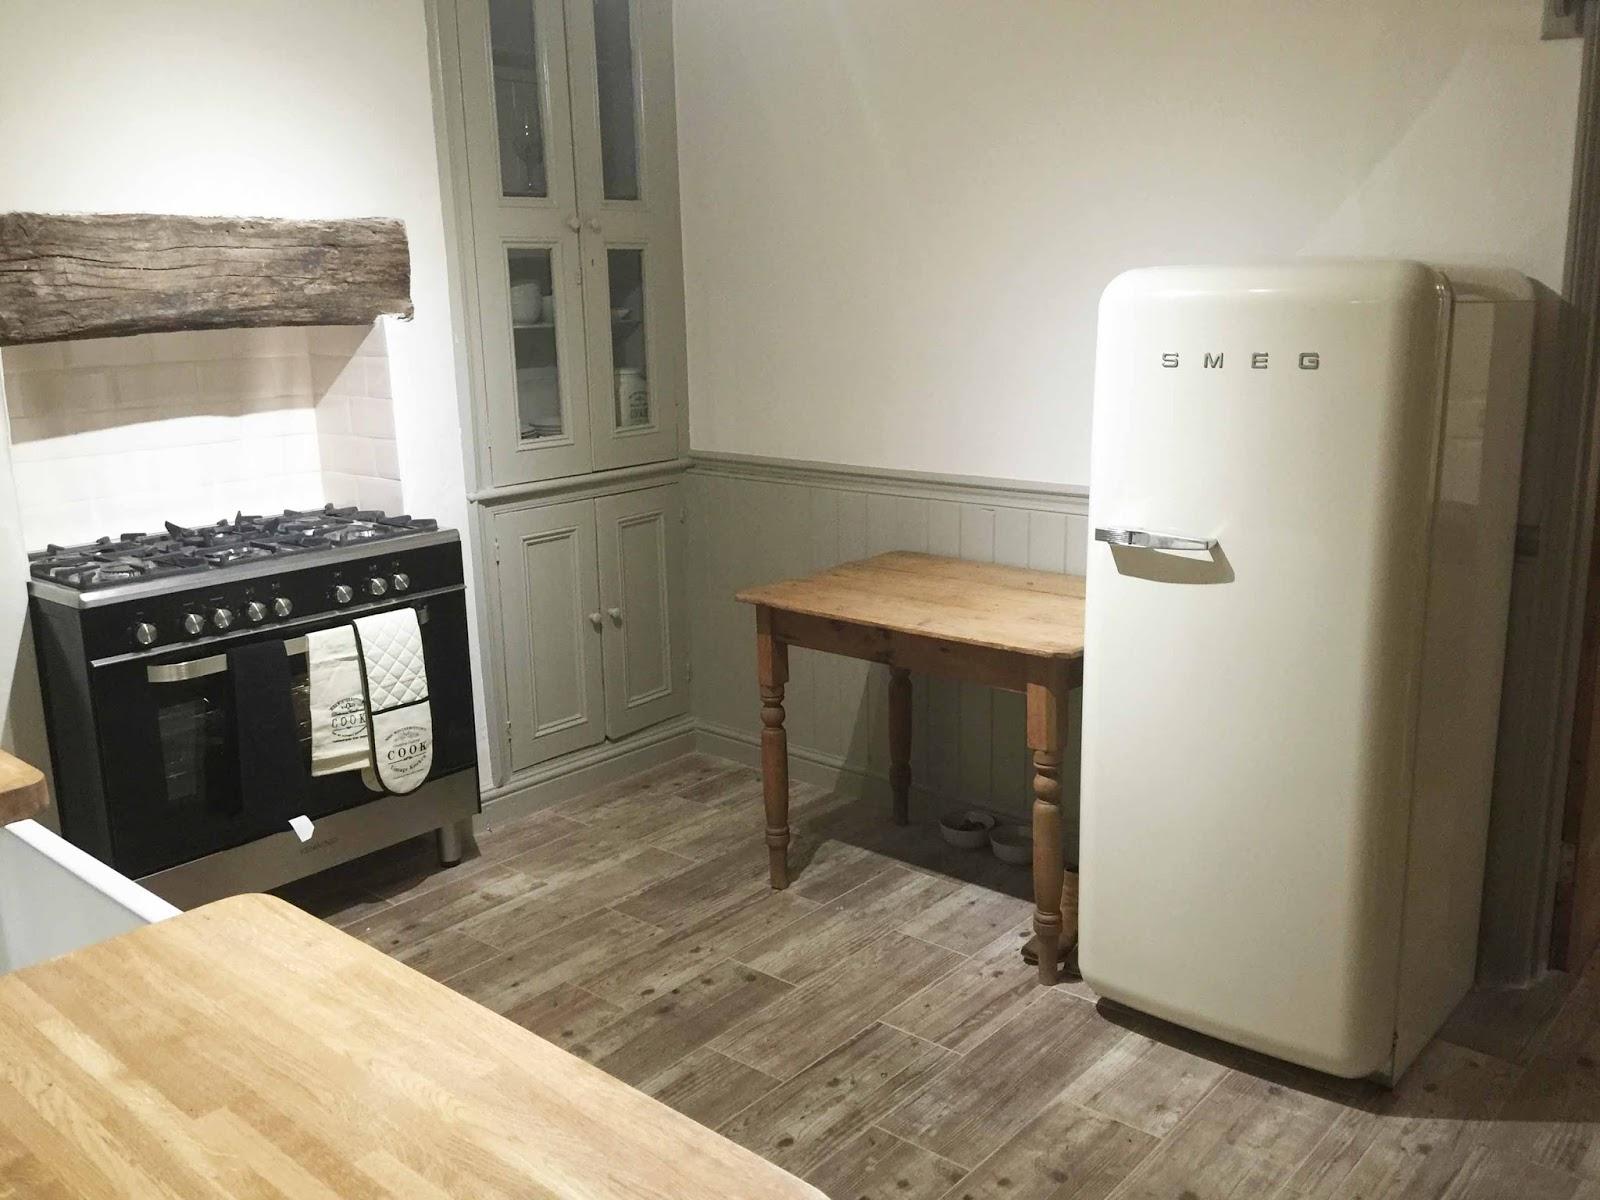 kitchen - interiors inspiration | styledcharlie